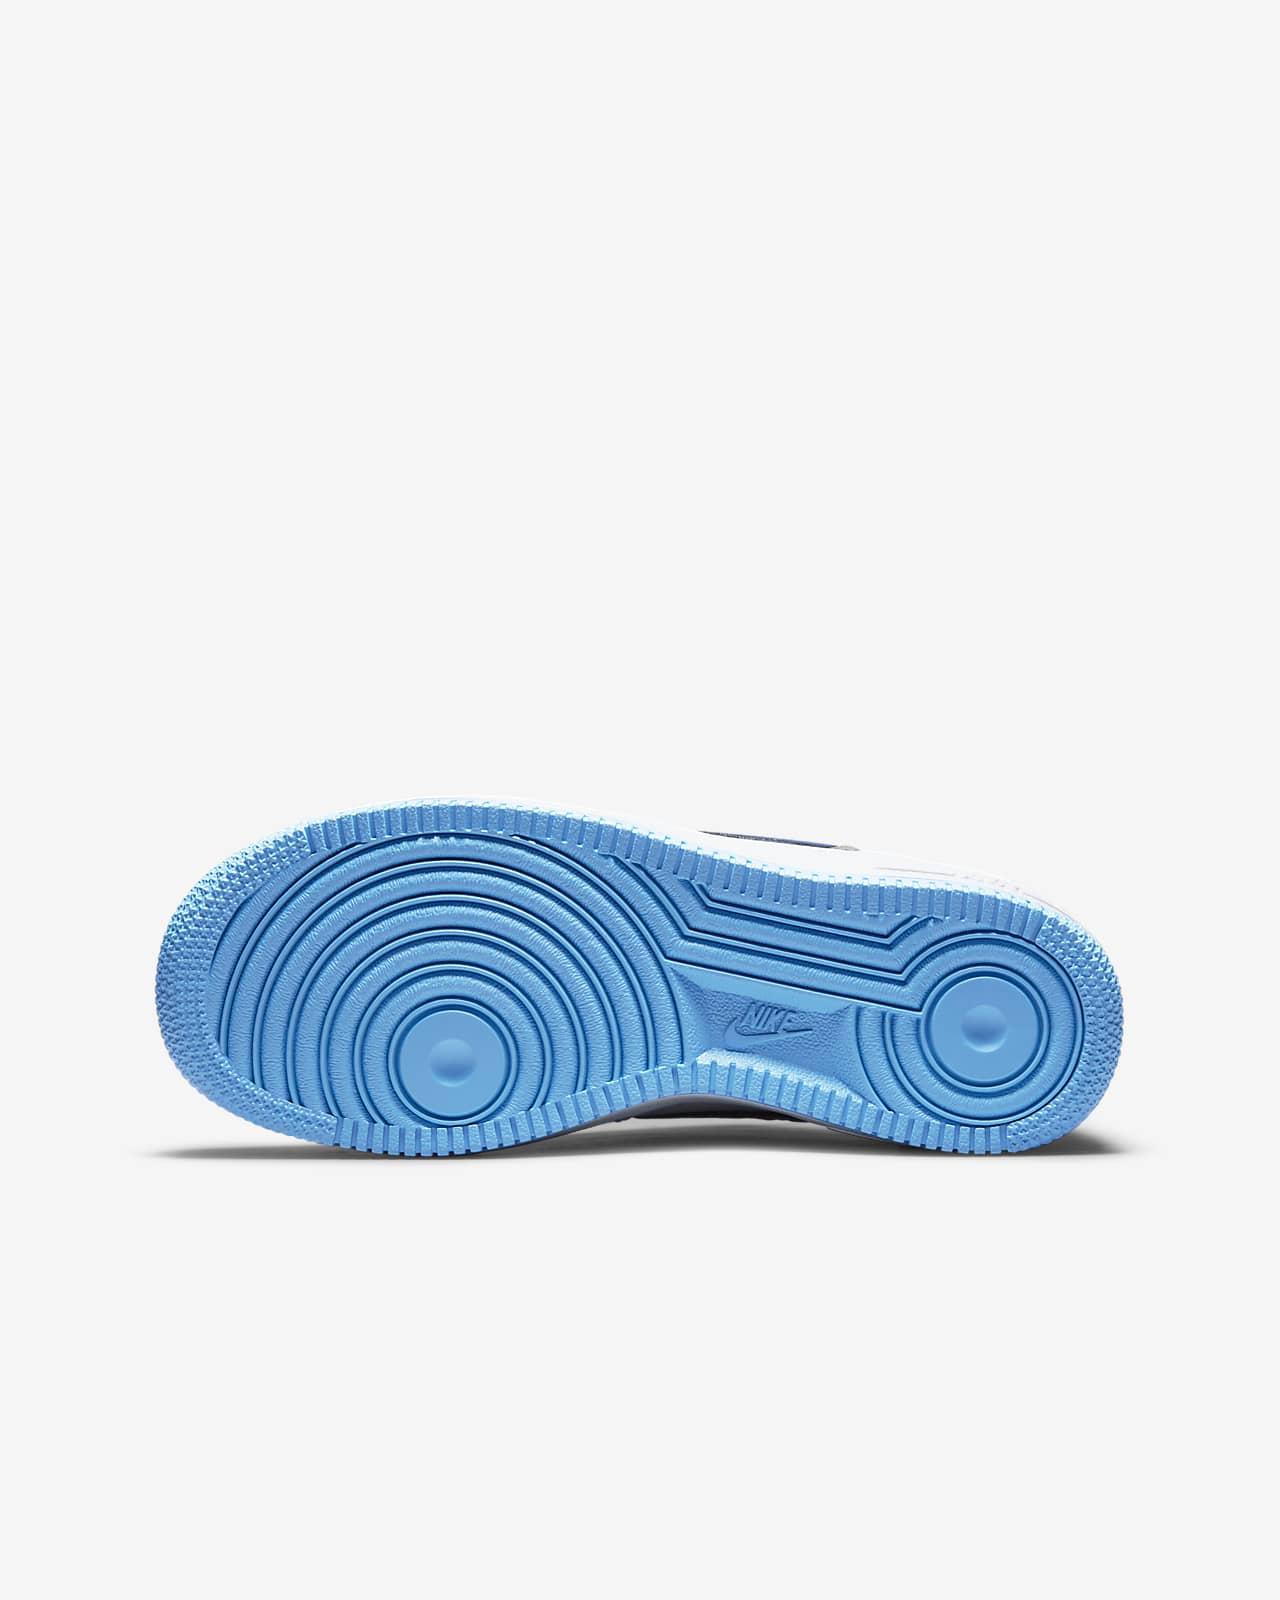 Nike Air Force 1 S50 Older Kids' Shoe. Nike LU